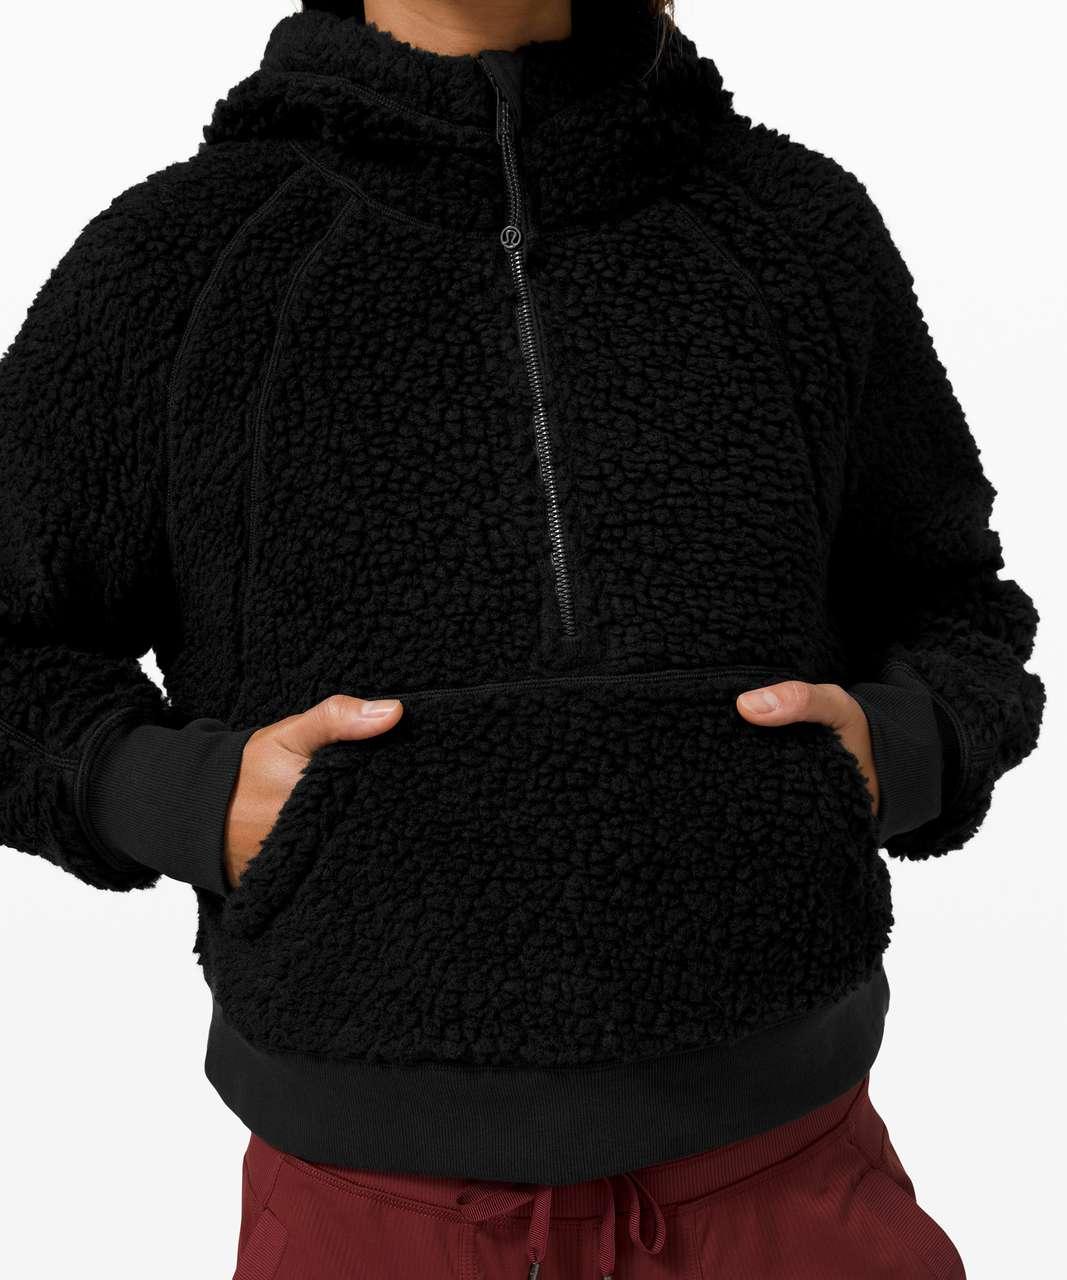 Lululemon Scuba Oversized Sherpa 1/2 Zip - Black